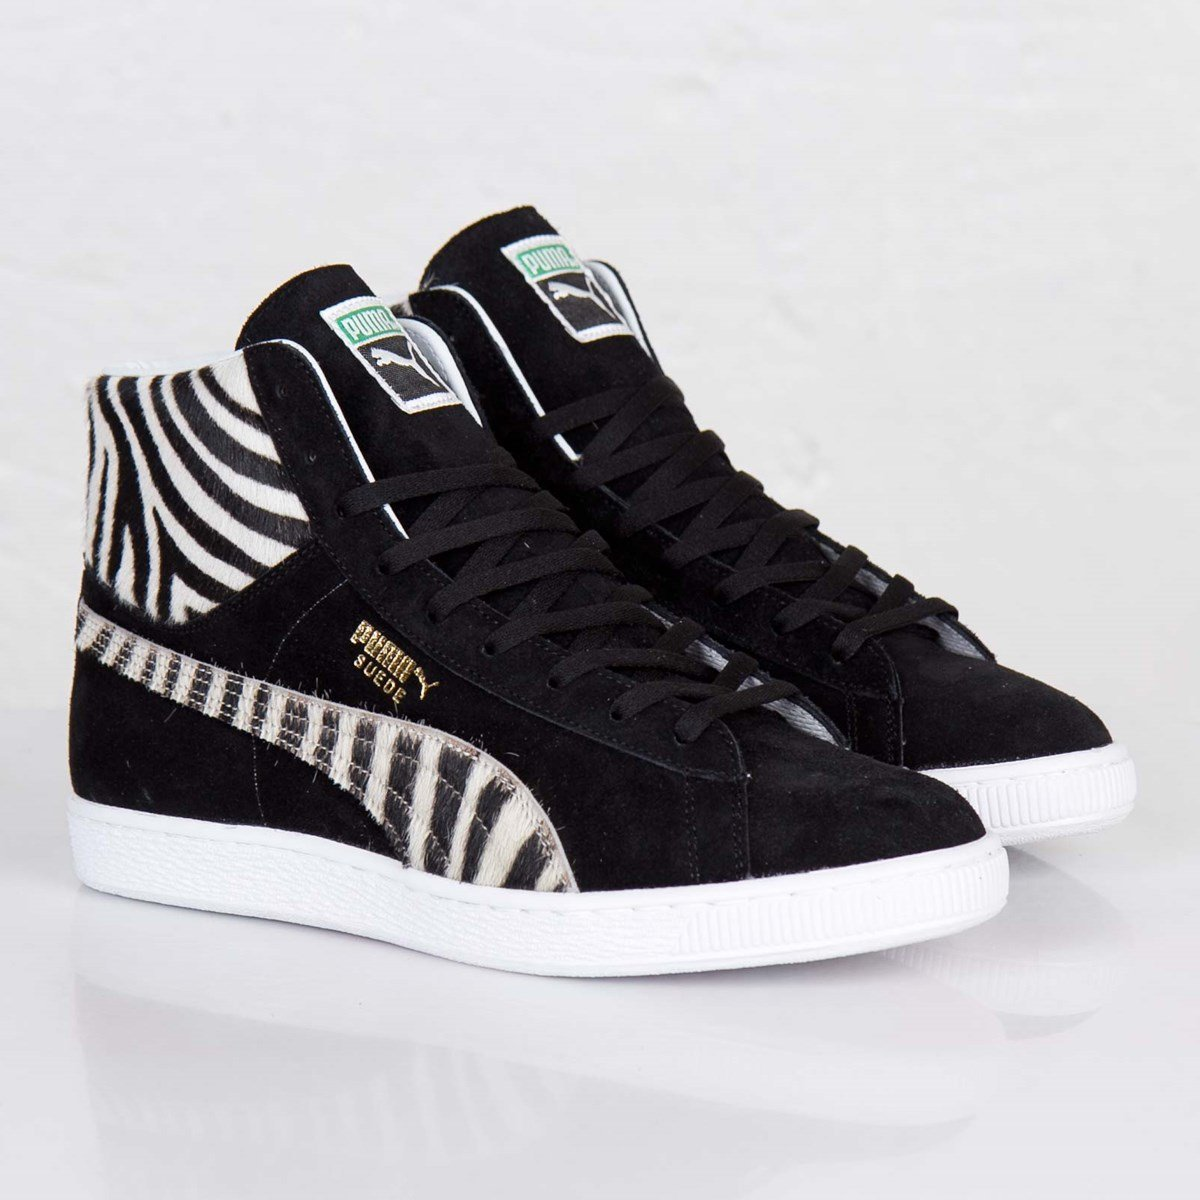 Puma Japan Suede Mid Zebra - 356585-01